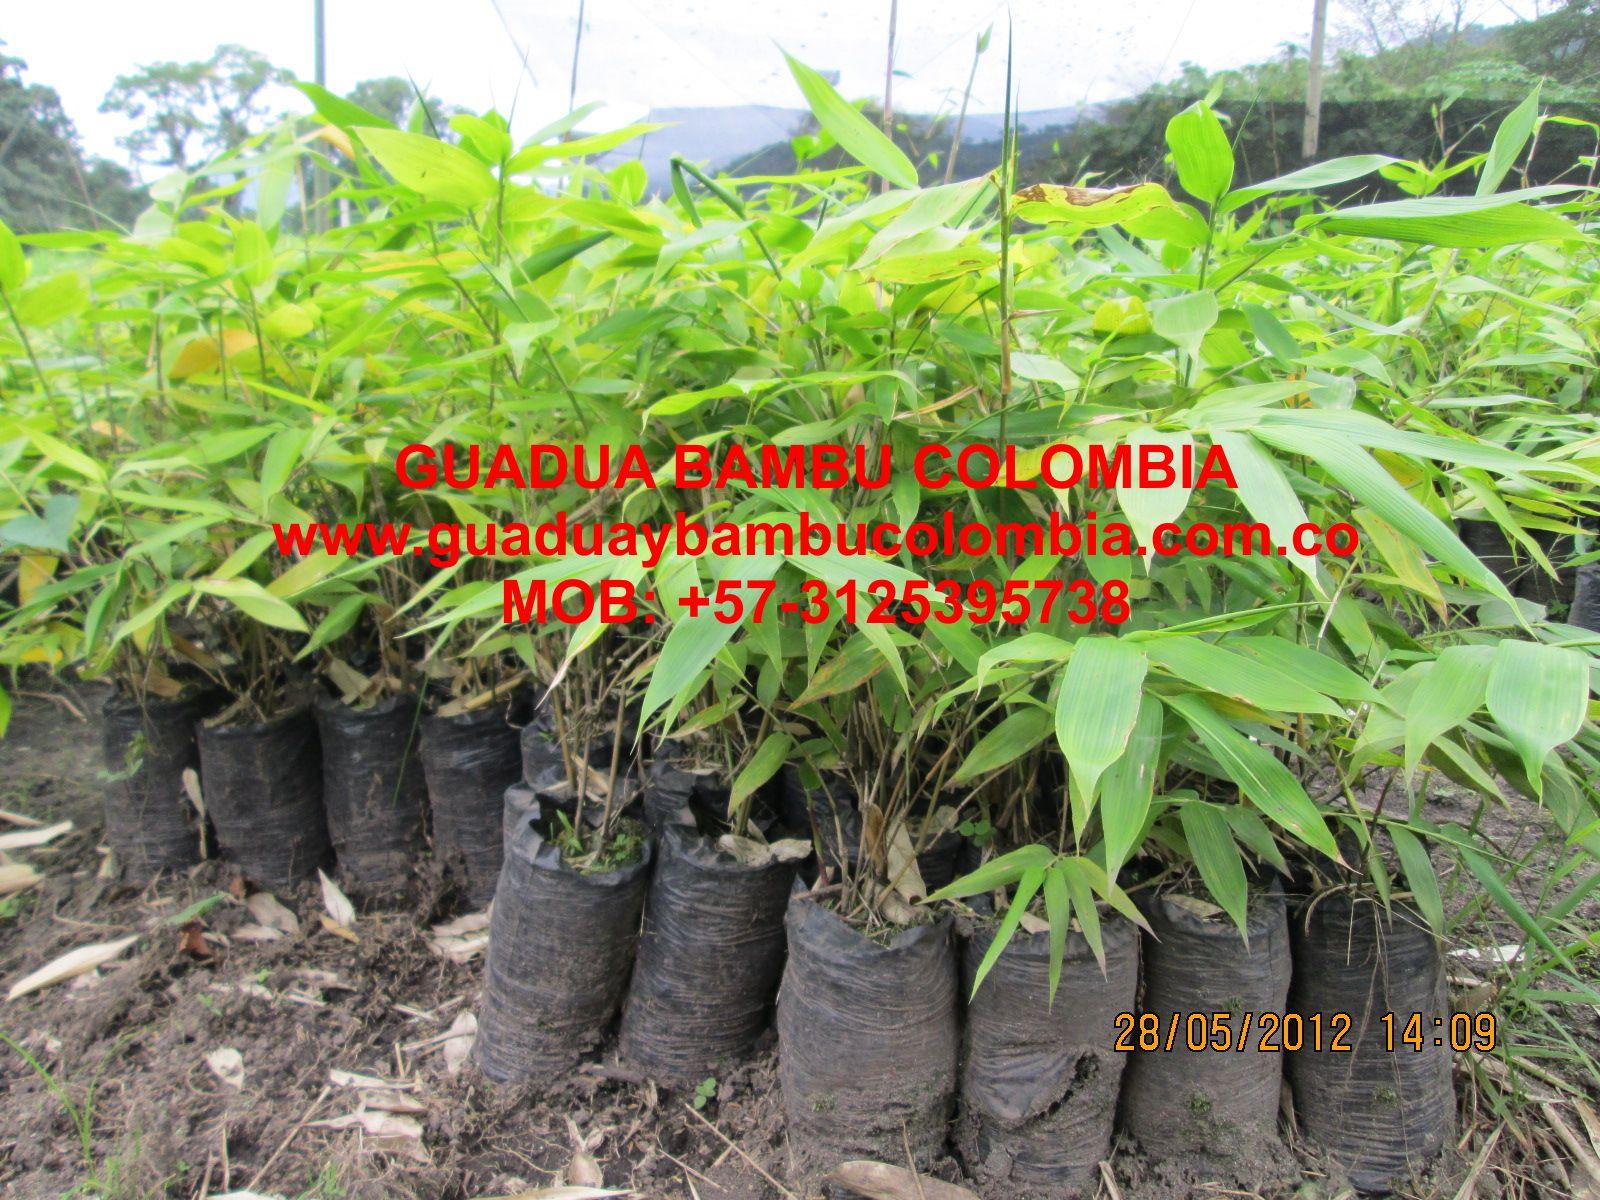 301 moved permanently - Reproduccion del bambu ...